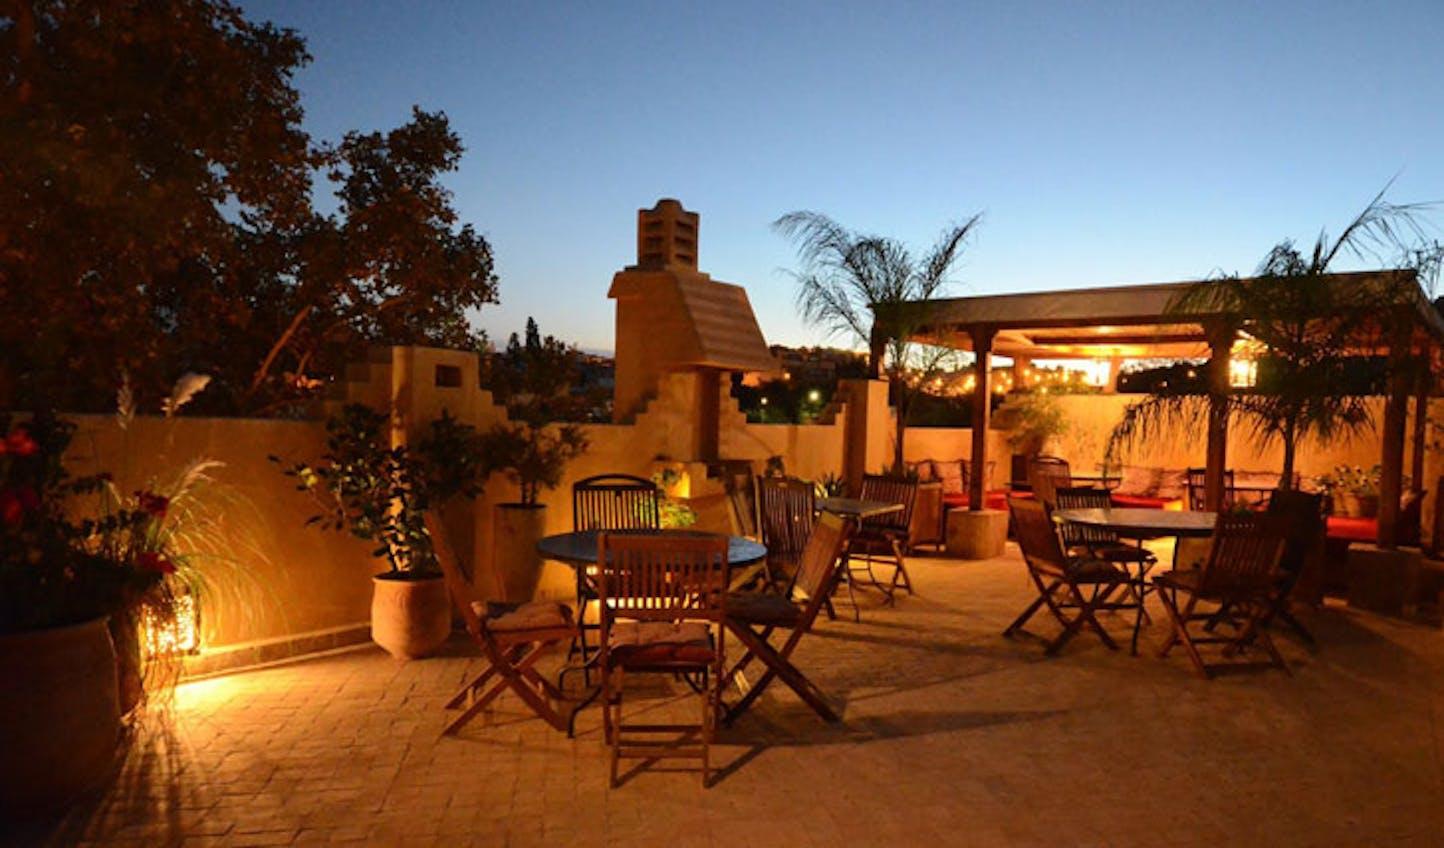 Roof terrace, Dar Roumana, Morocco